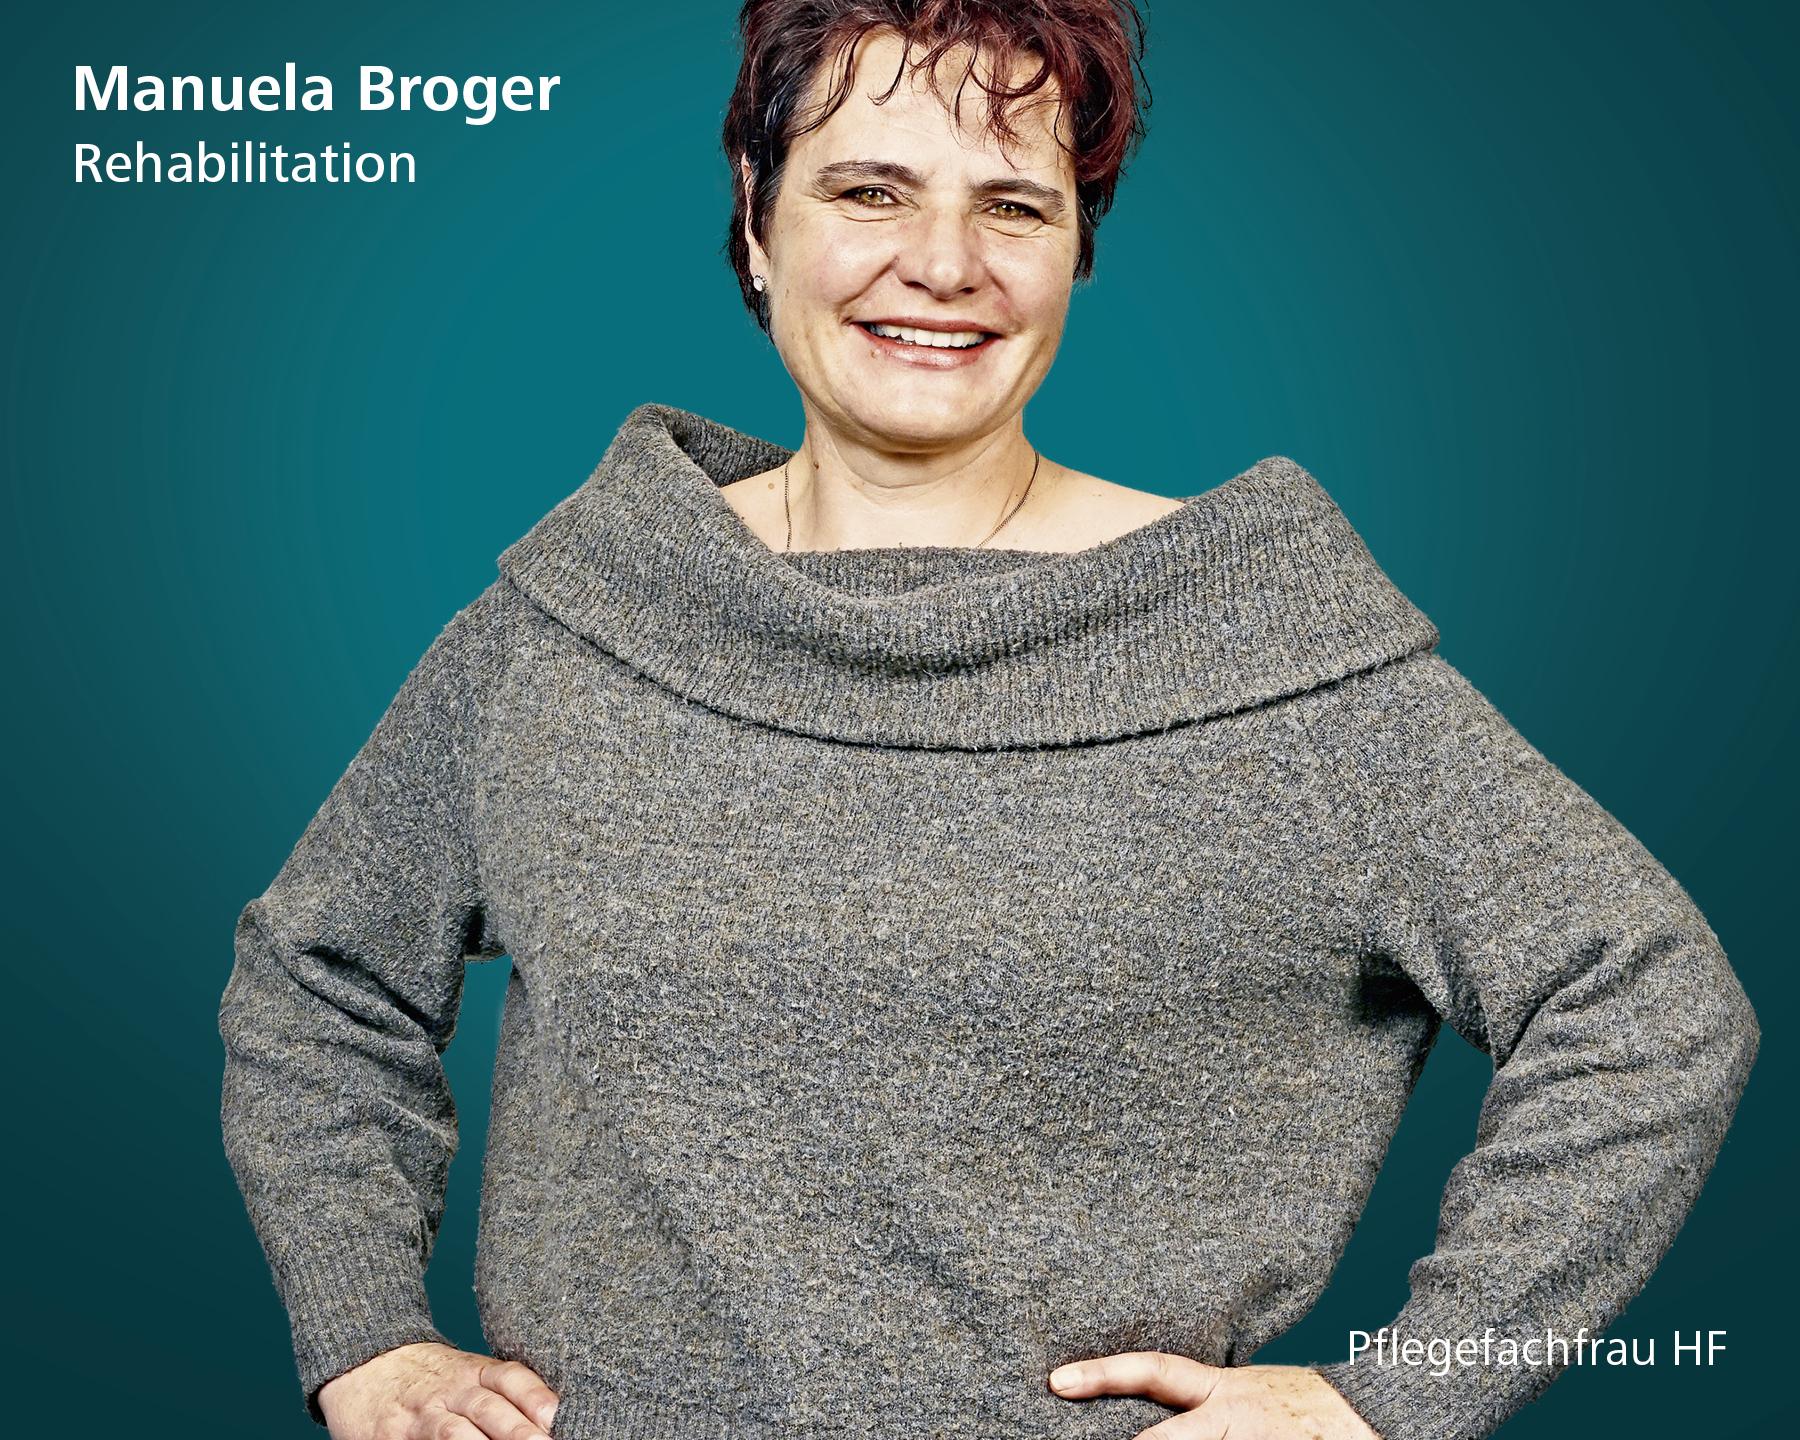 Manuela Broger 810_7528 - Schweizer Paraplegiker-Zentrum